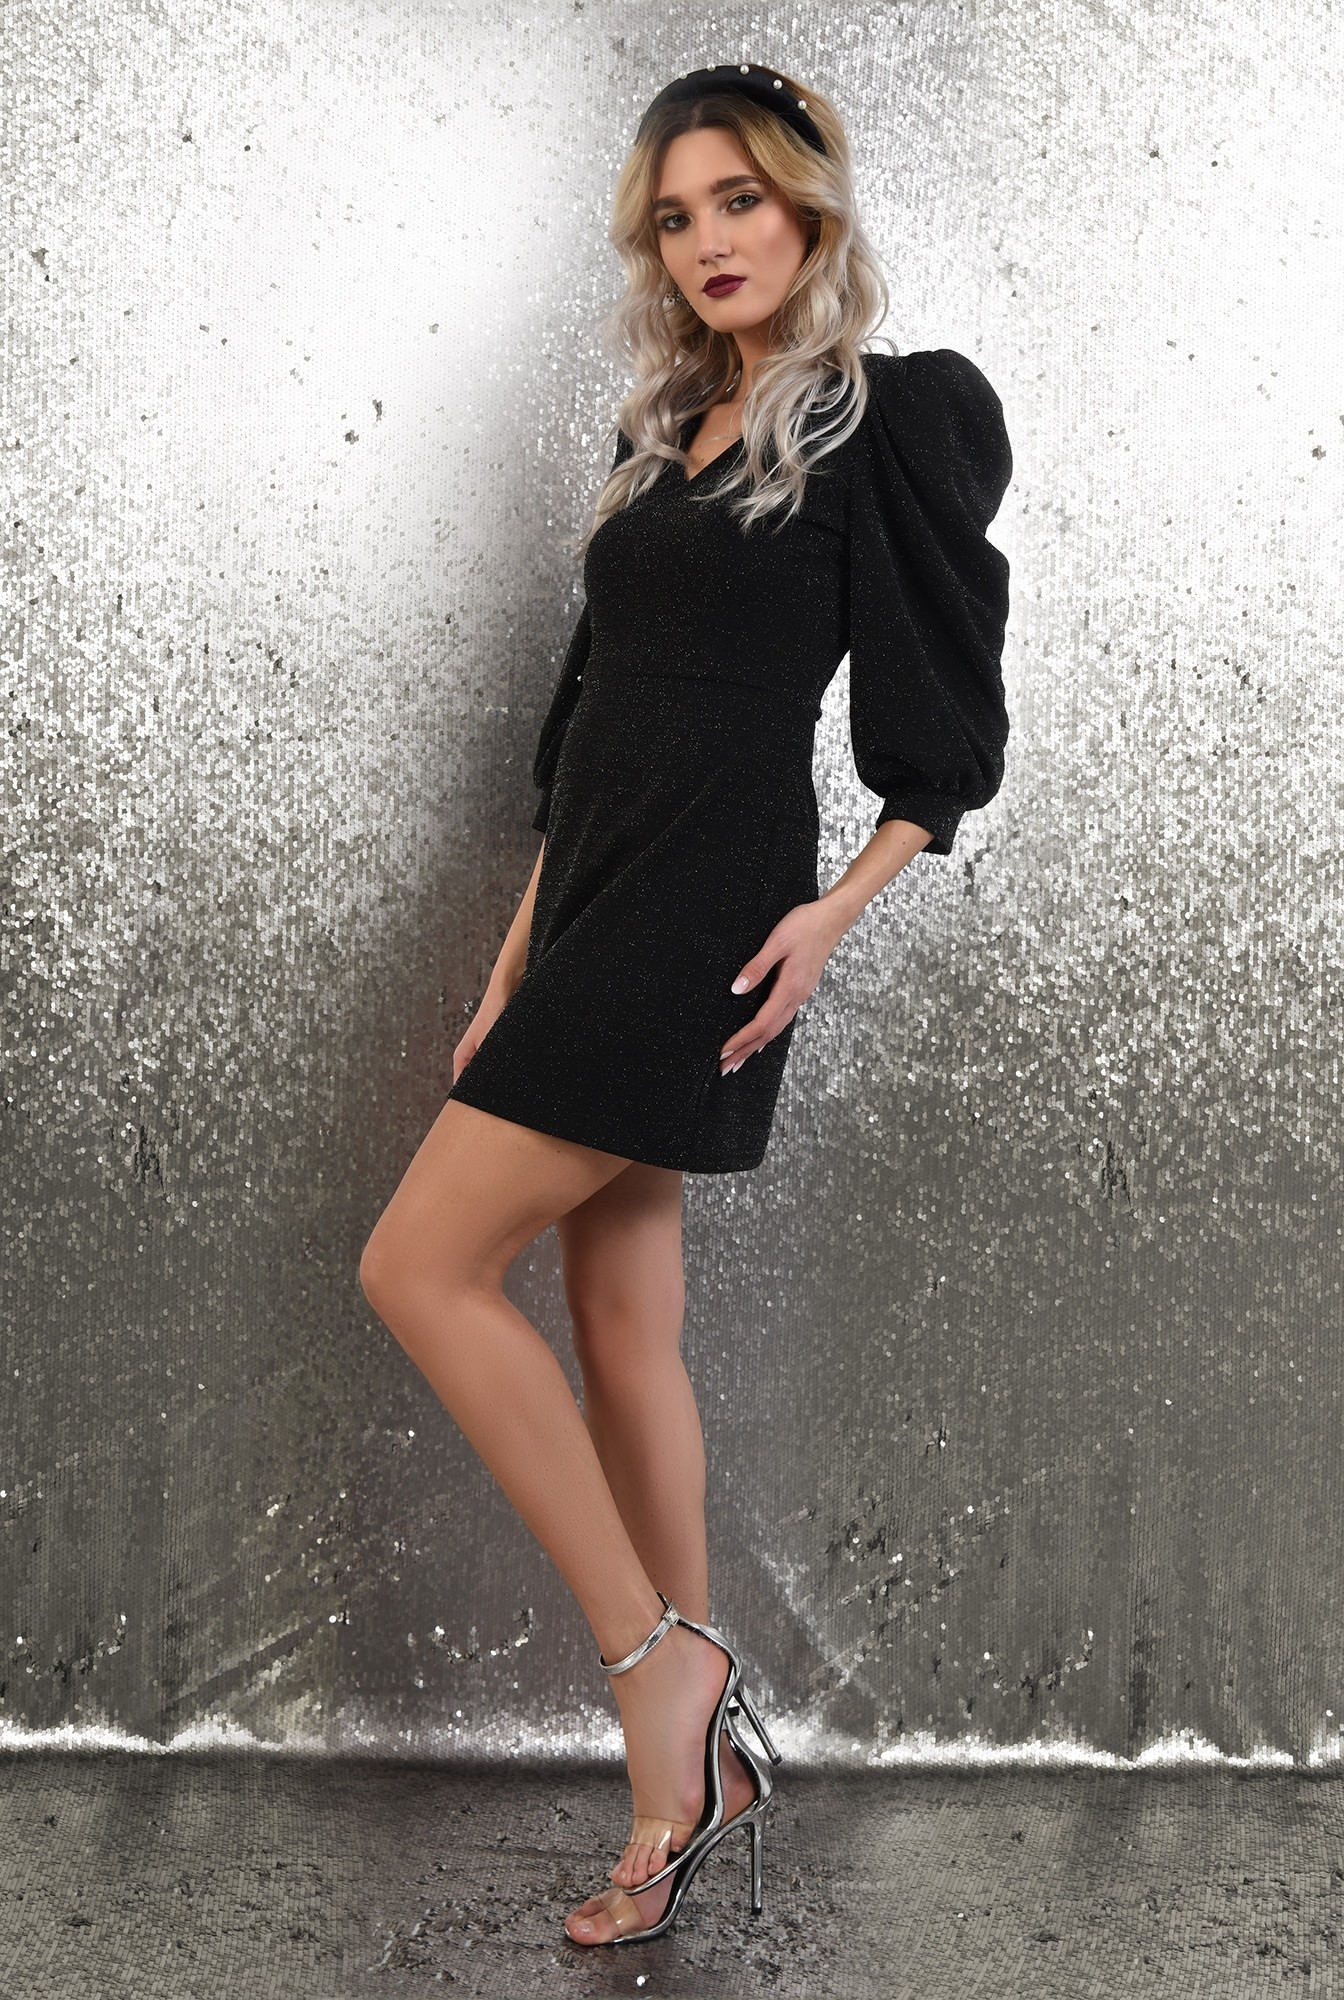 0 - rochie neagra, de ocazie, cu sclipici, anchior, maneci bufante